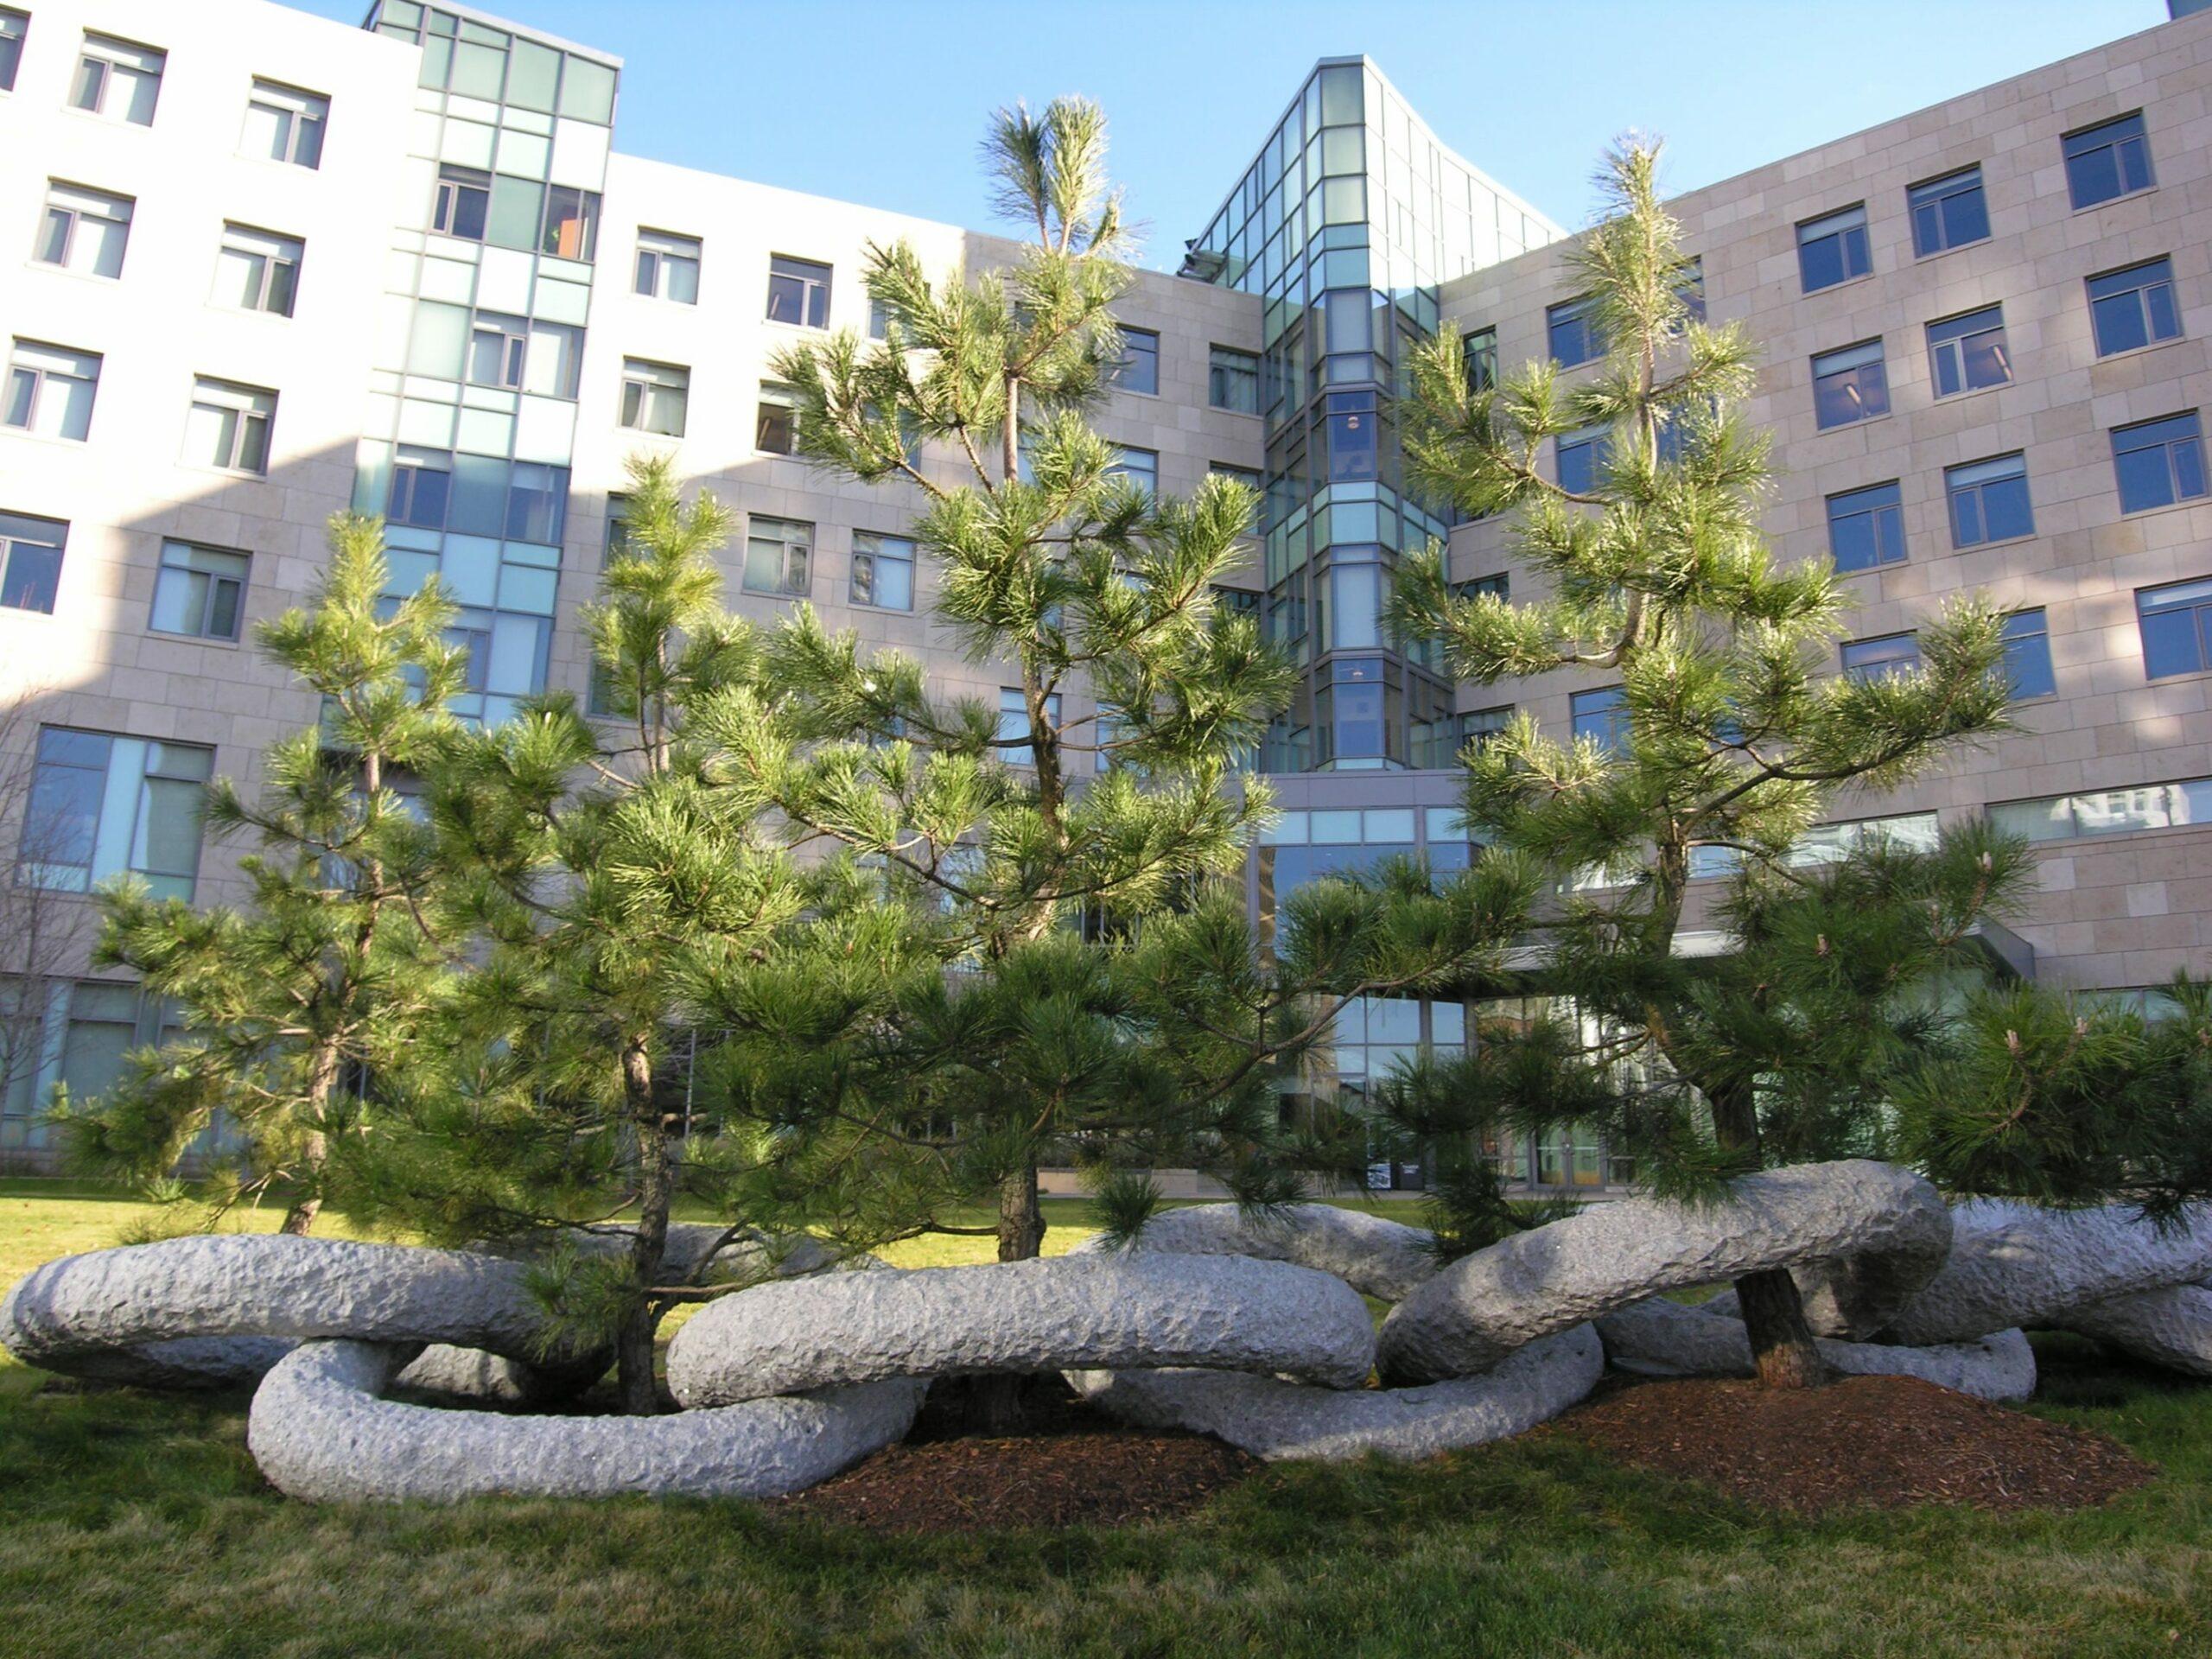 Japanese Black Pines grace Sloan Finance building at MIT, Cambridge, MA